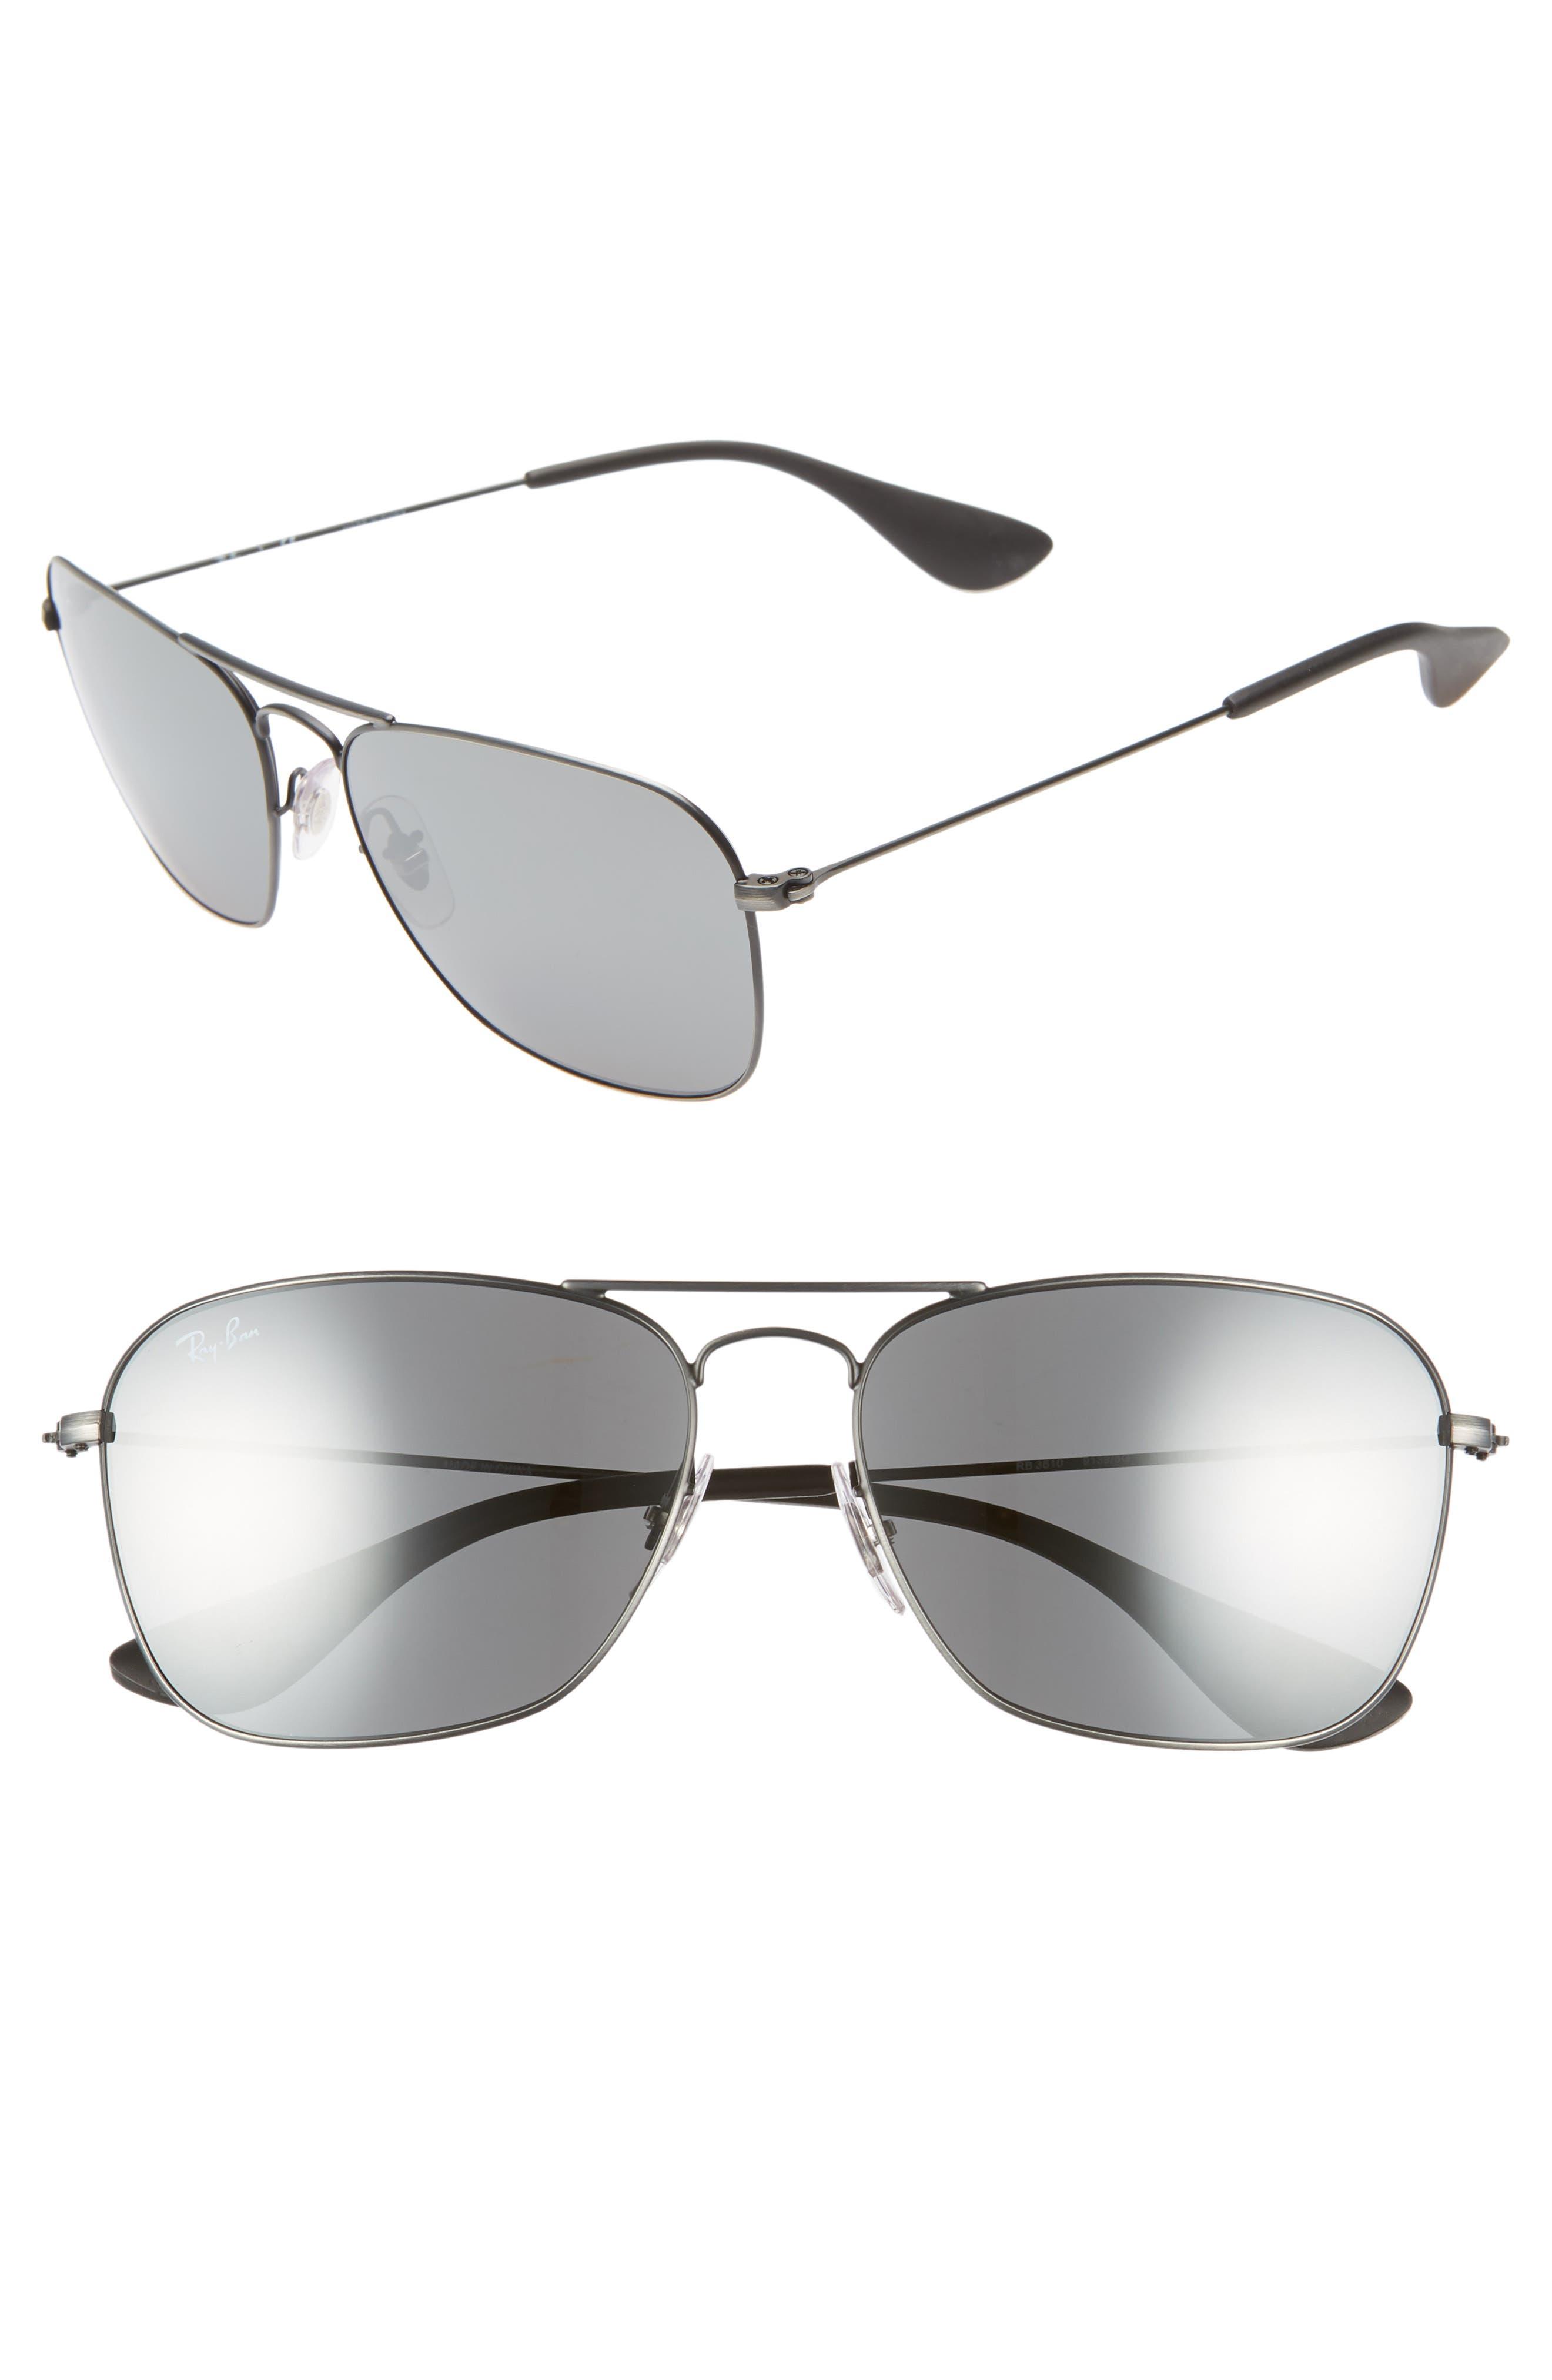 Ray-Ban Navigator 5m Squared Sunglasses - Matte Black